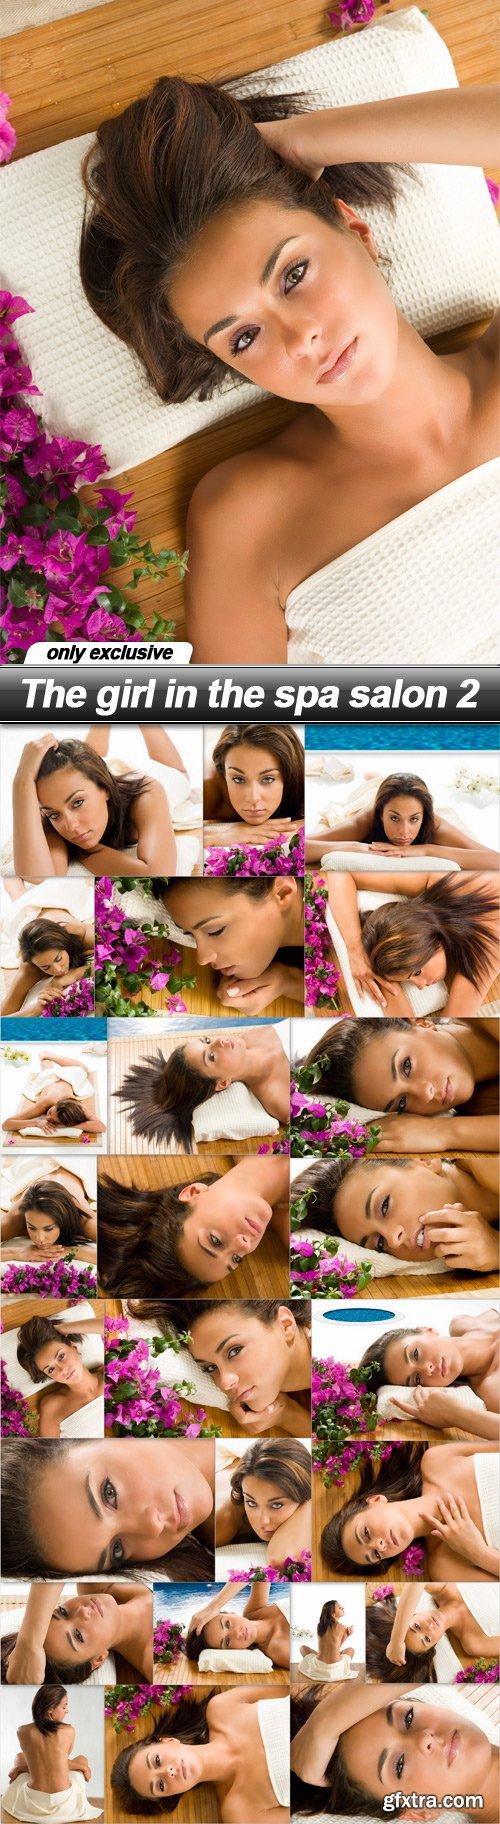 The girl in the spa salon 2 - 25 UHQ JPEG